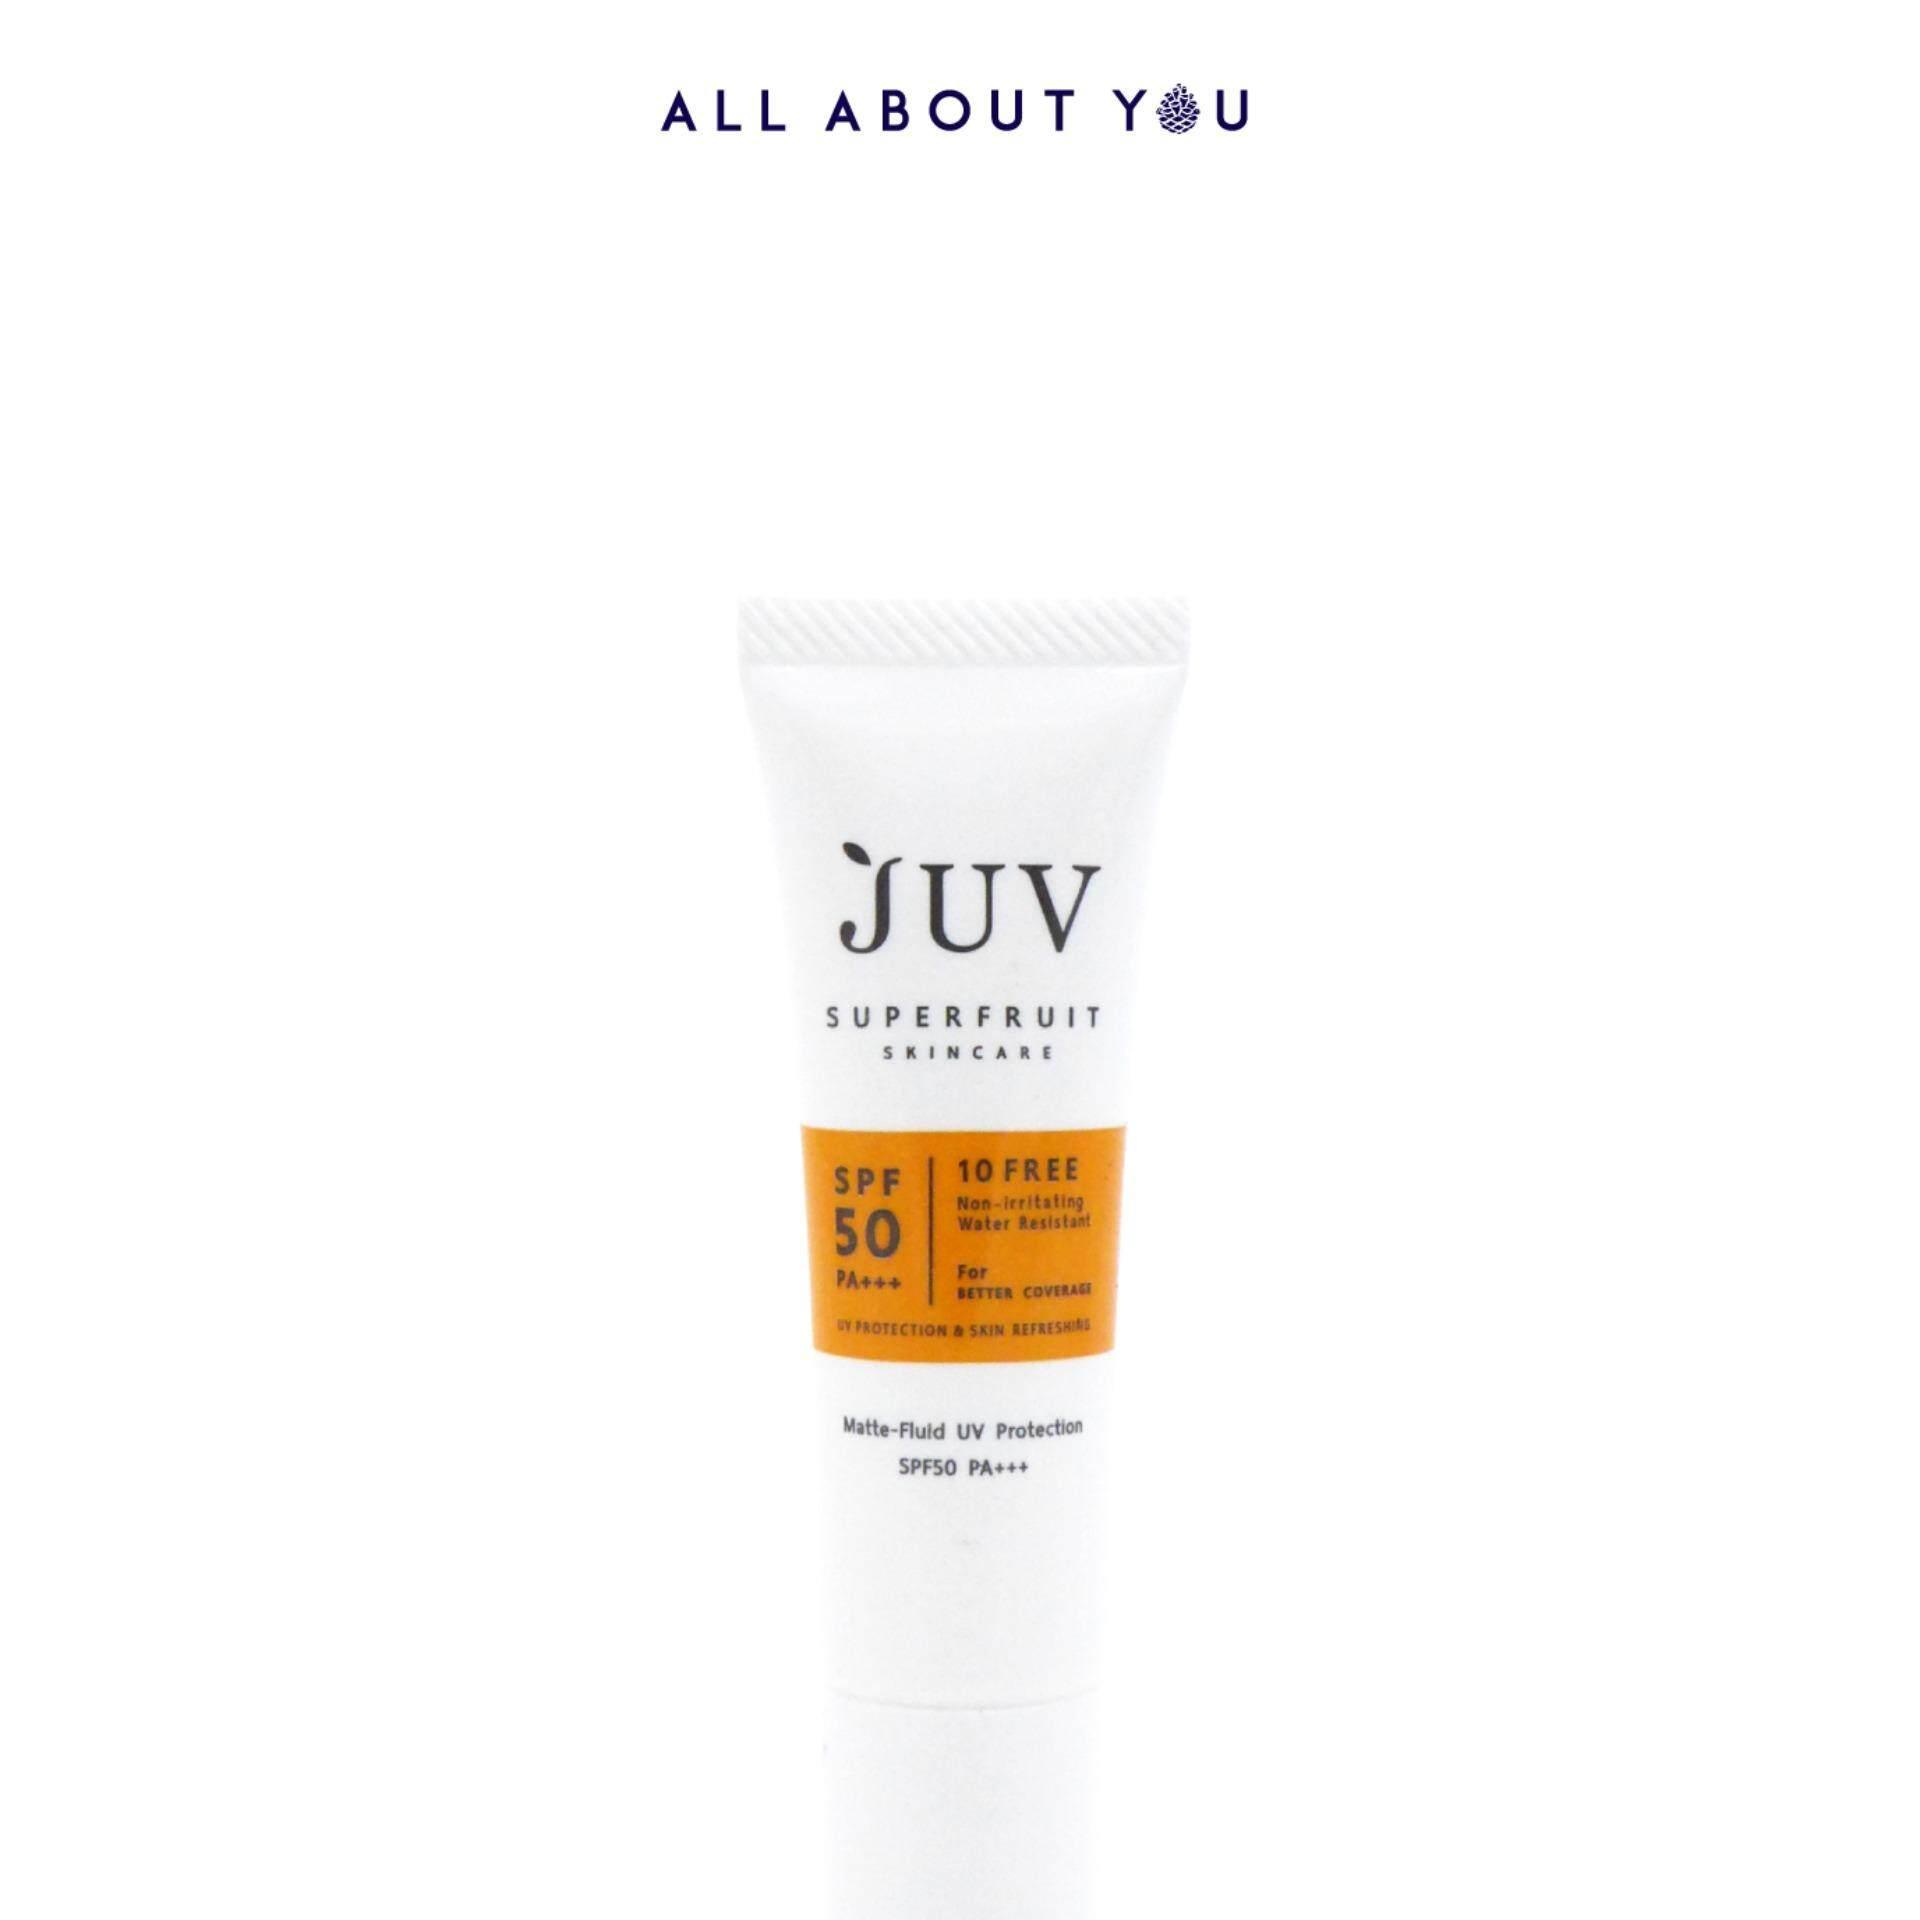 JUV Matte-Fluid UV Protection SPF 50 PA+++ 8 ml